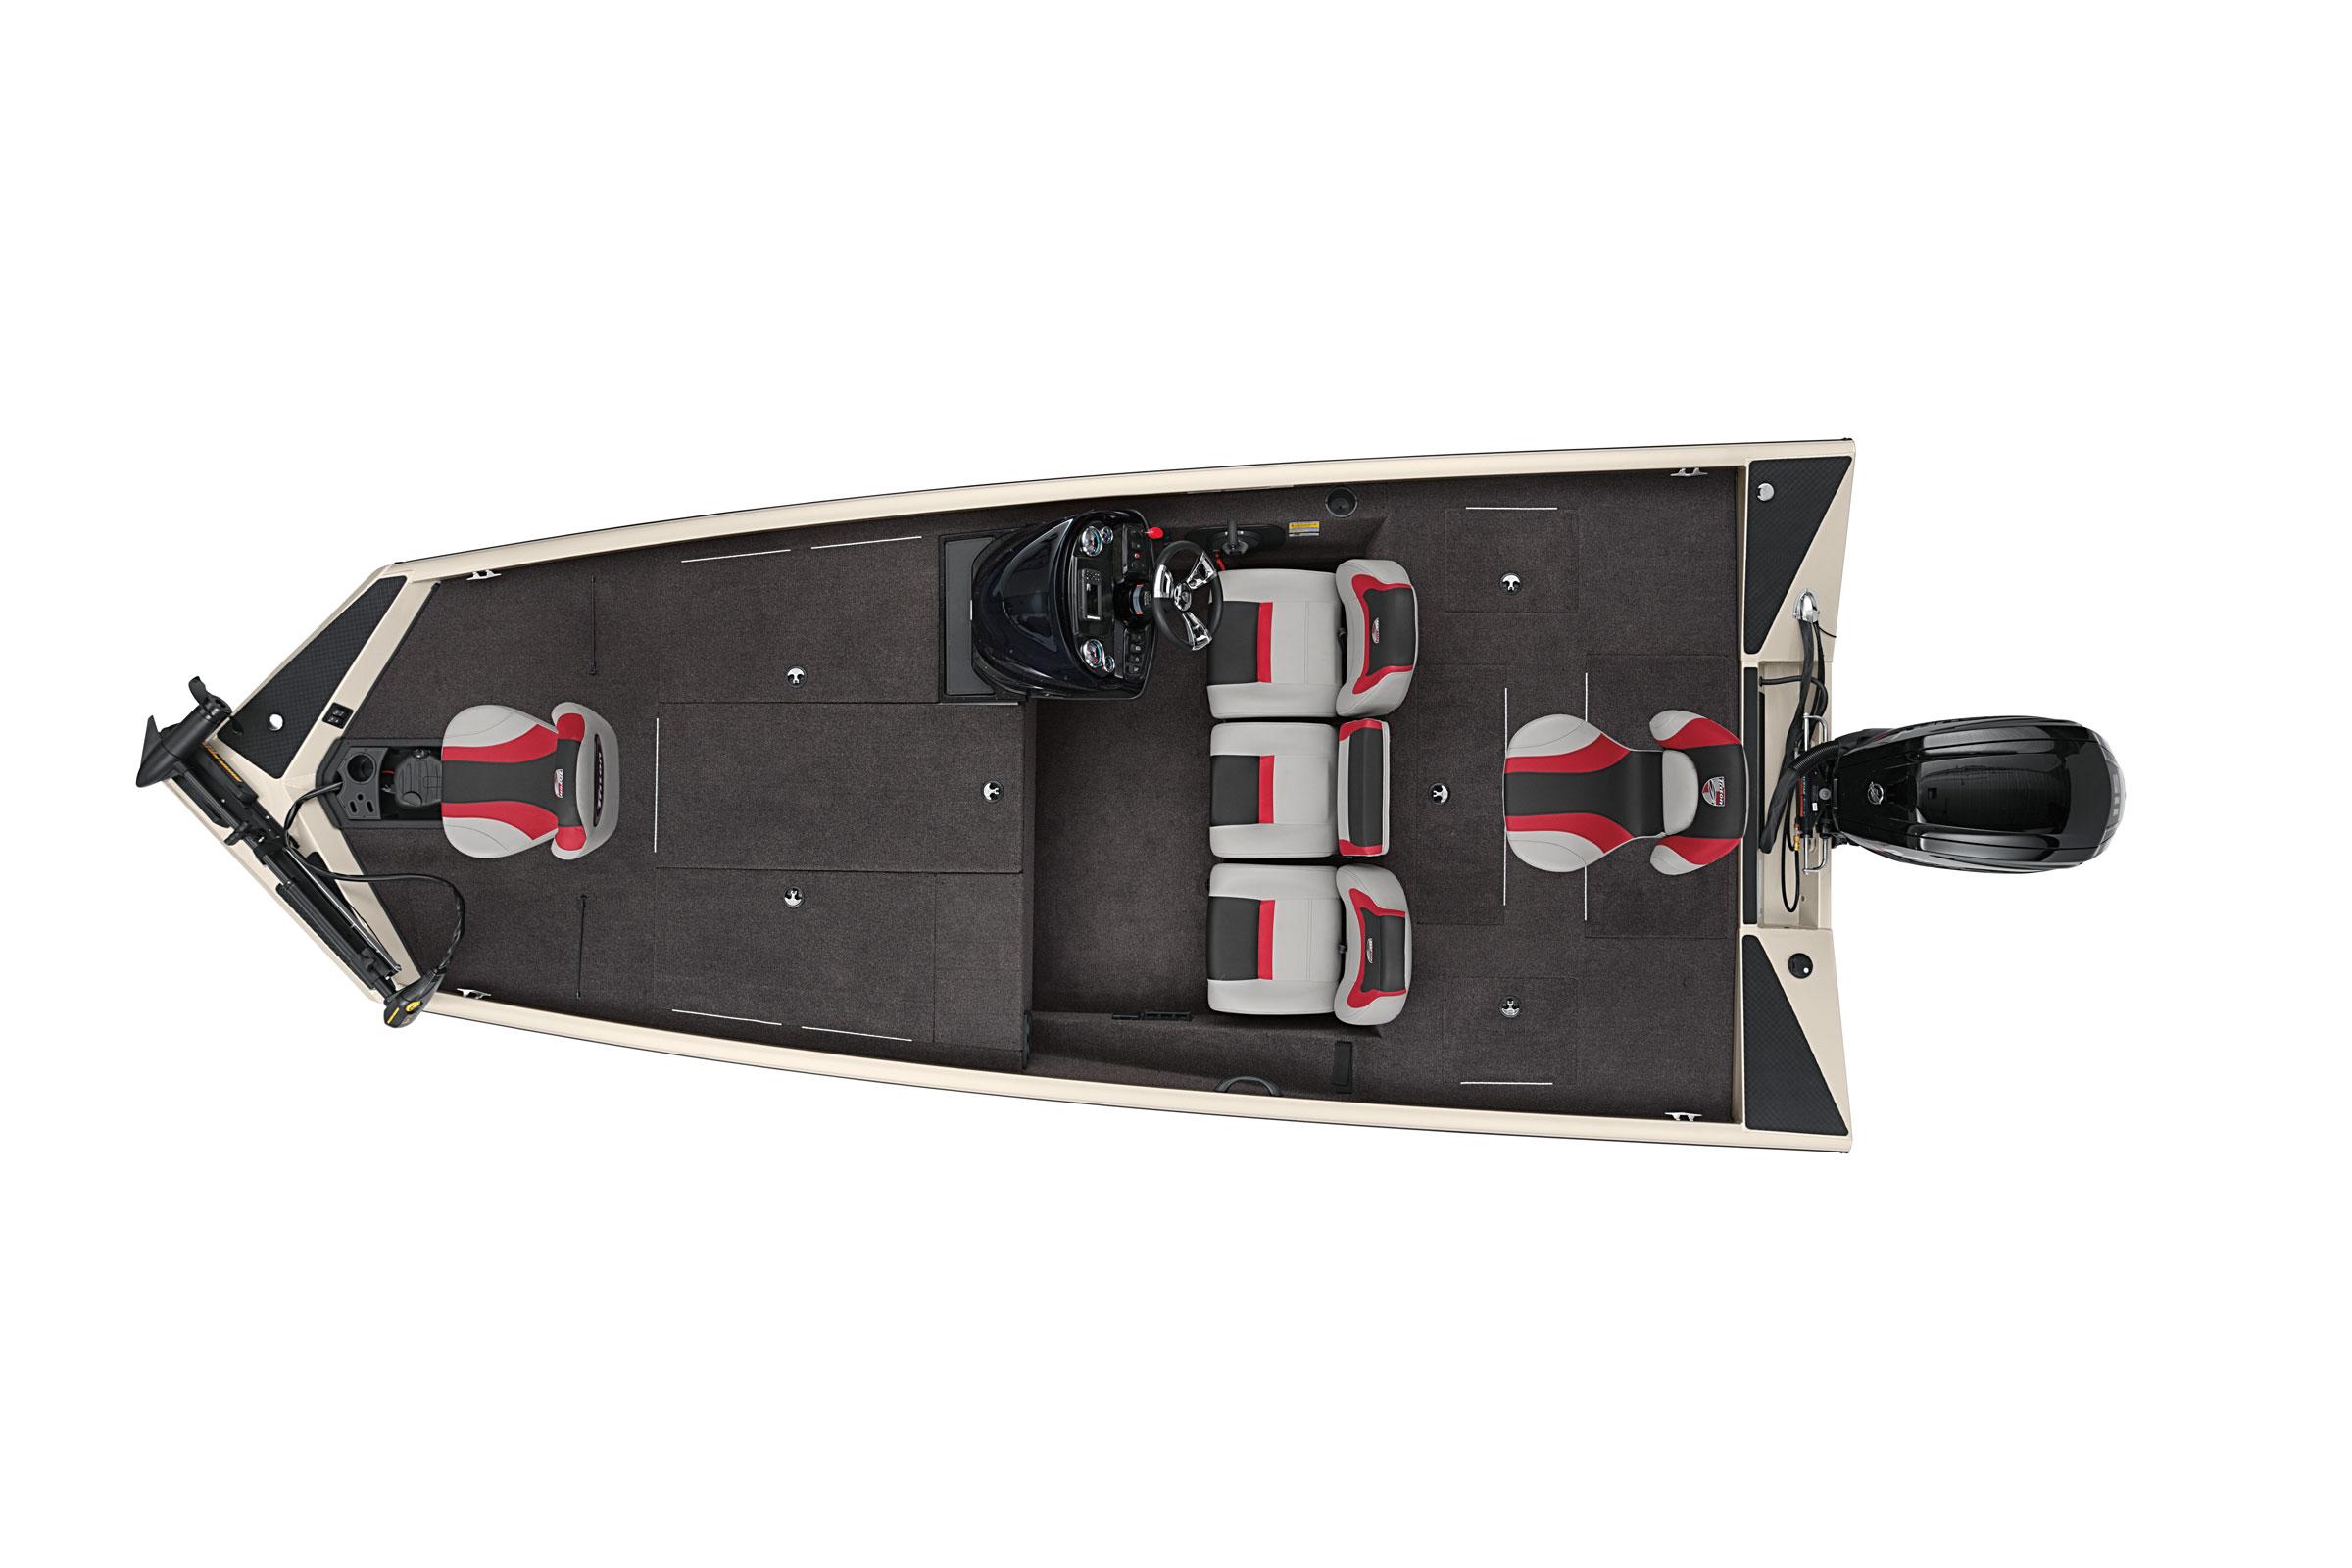 2020 Triton Aluminum Boats Bass Crappie And Jon Boats